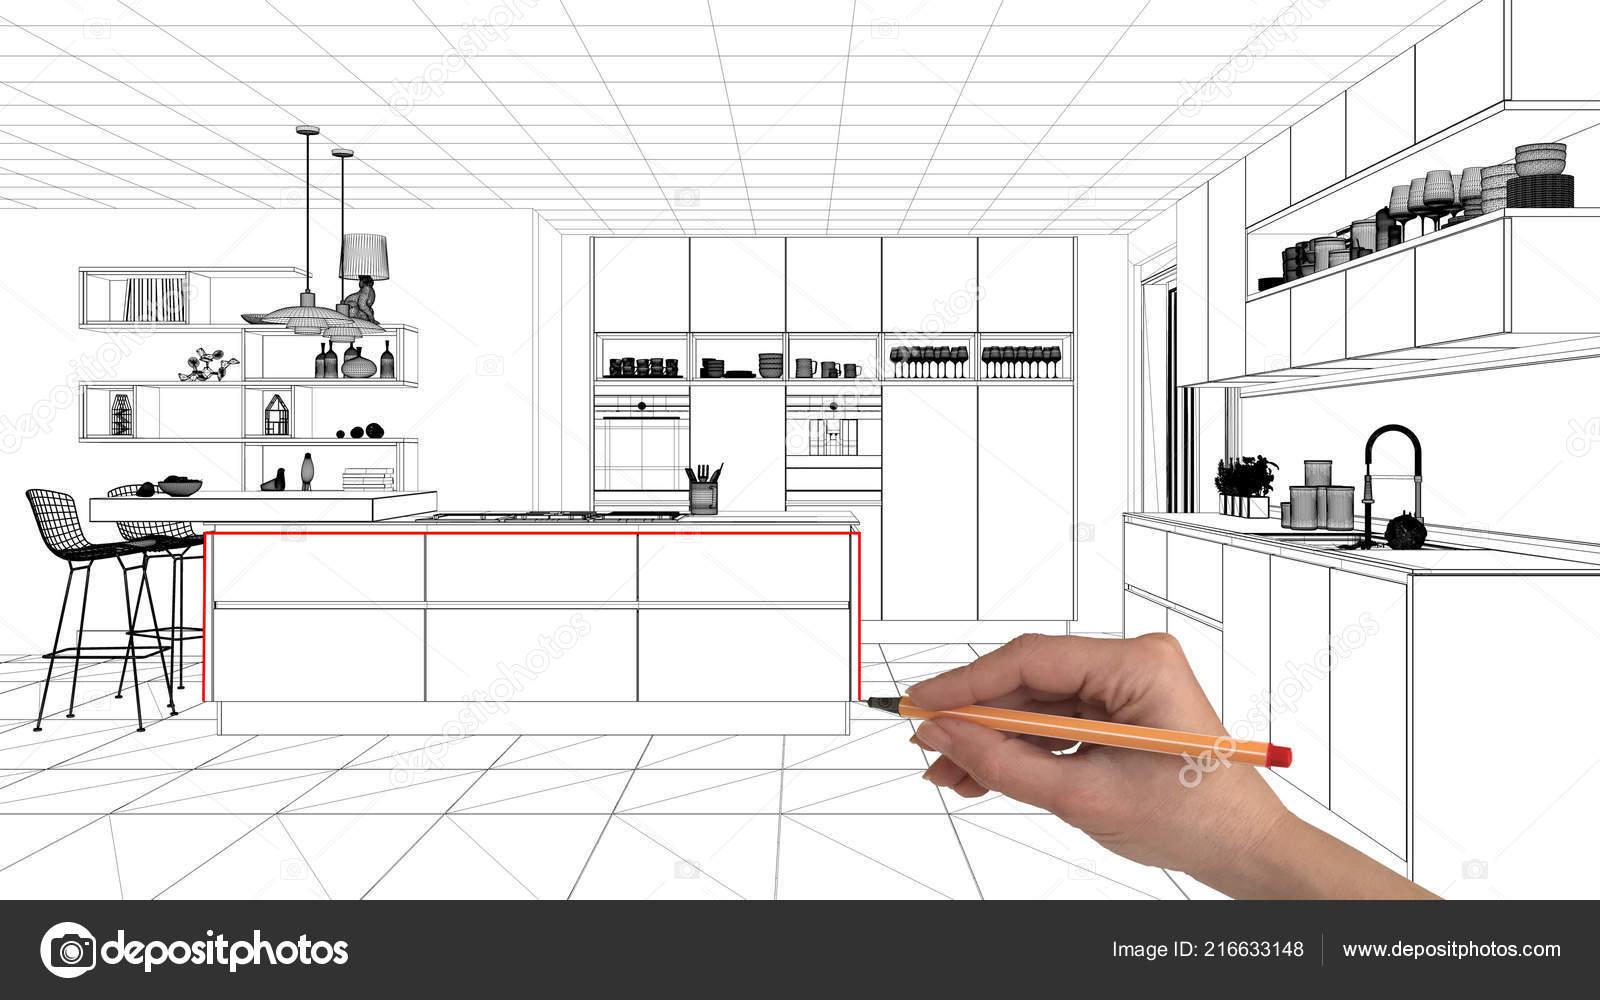 Interior Design Project Concept Hand Drawing Custom Architecture Black White Stock Photo C Archiviz 216633148